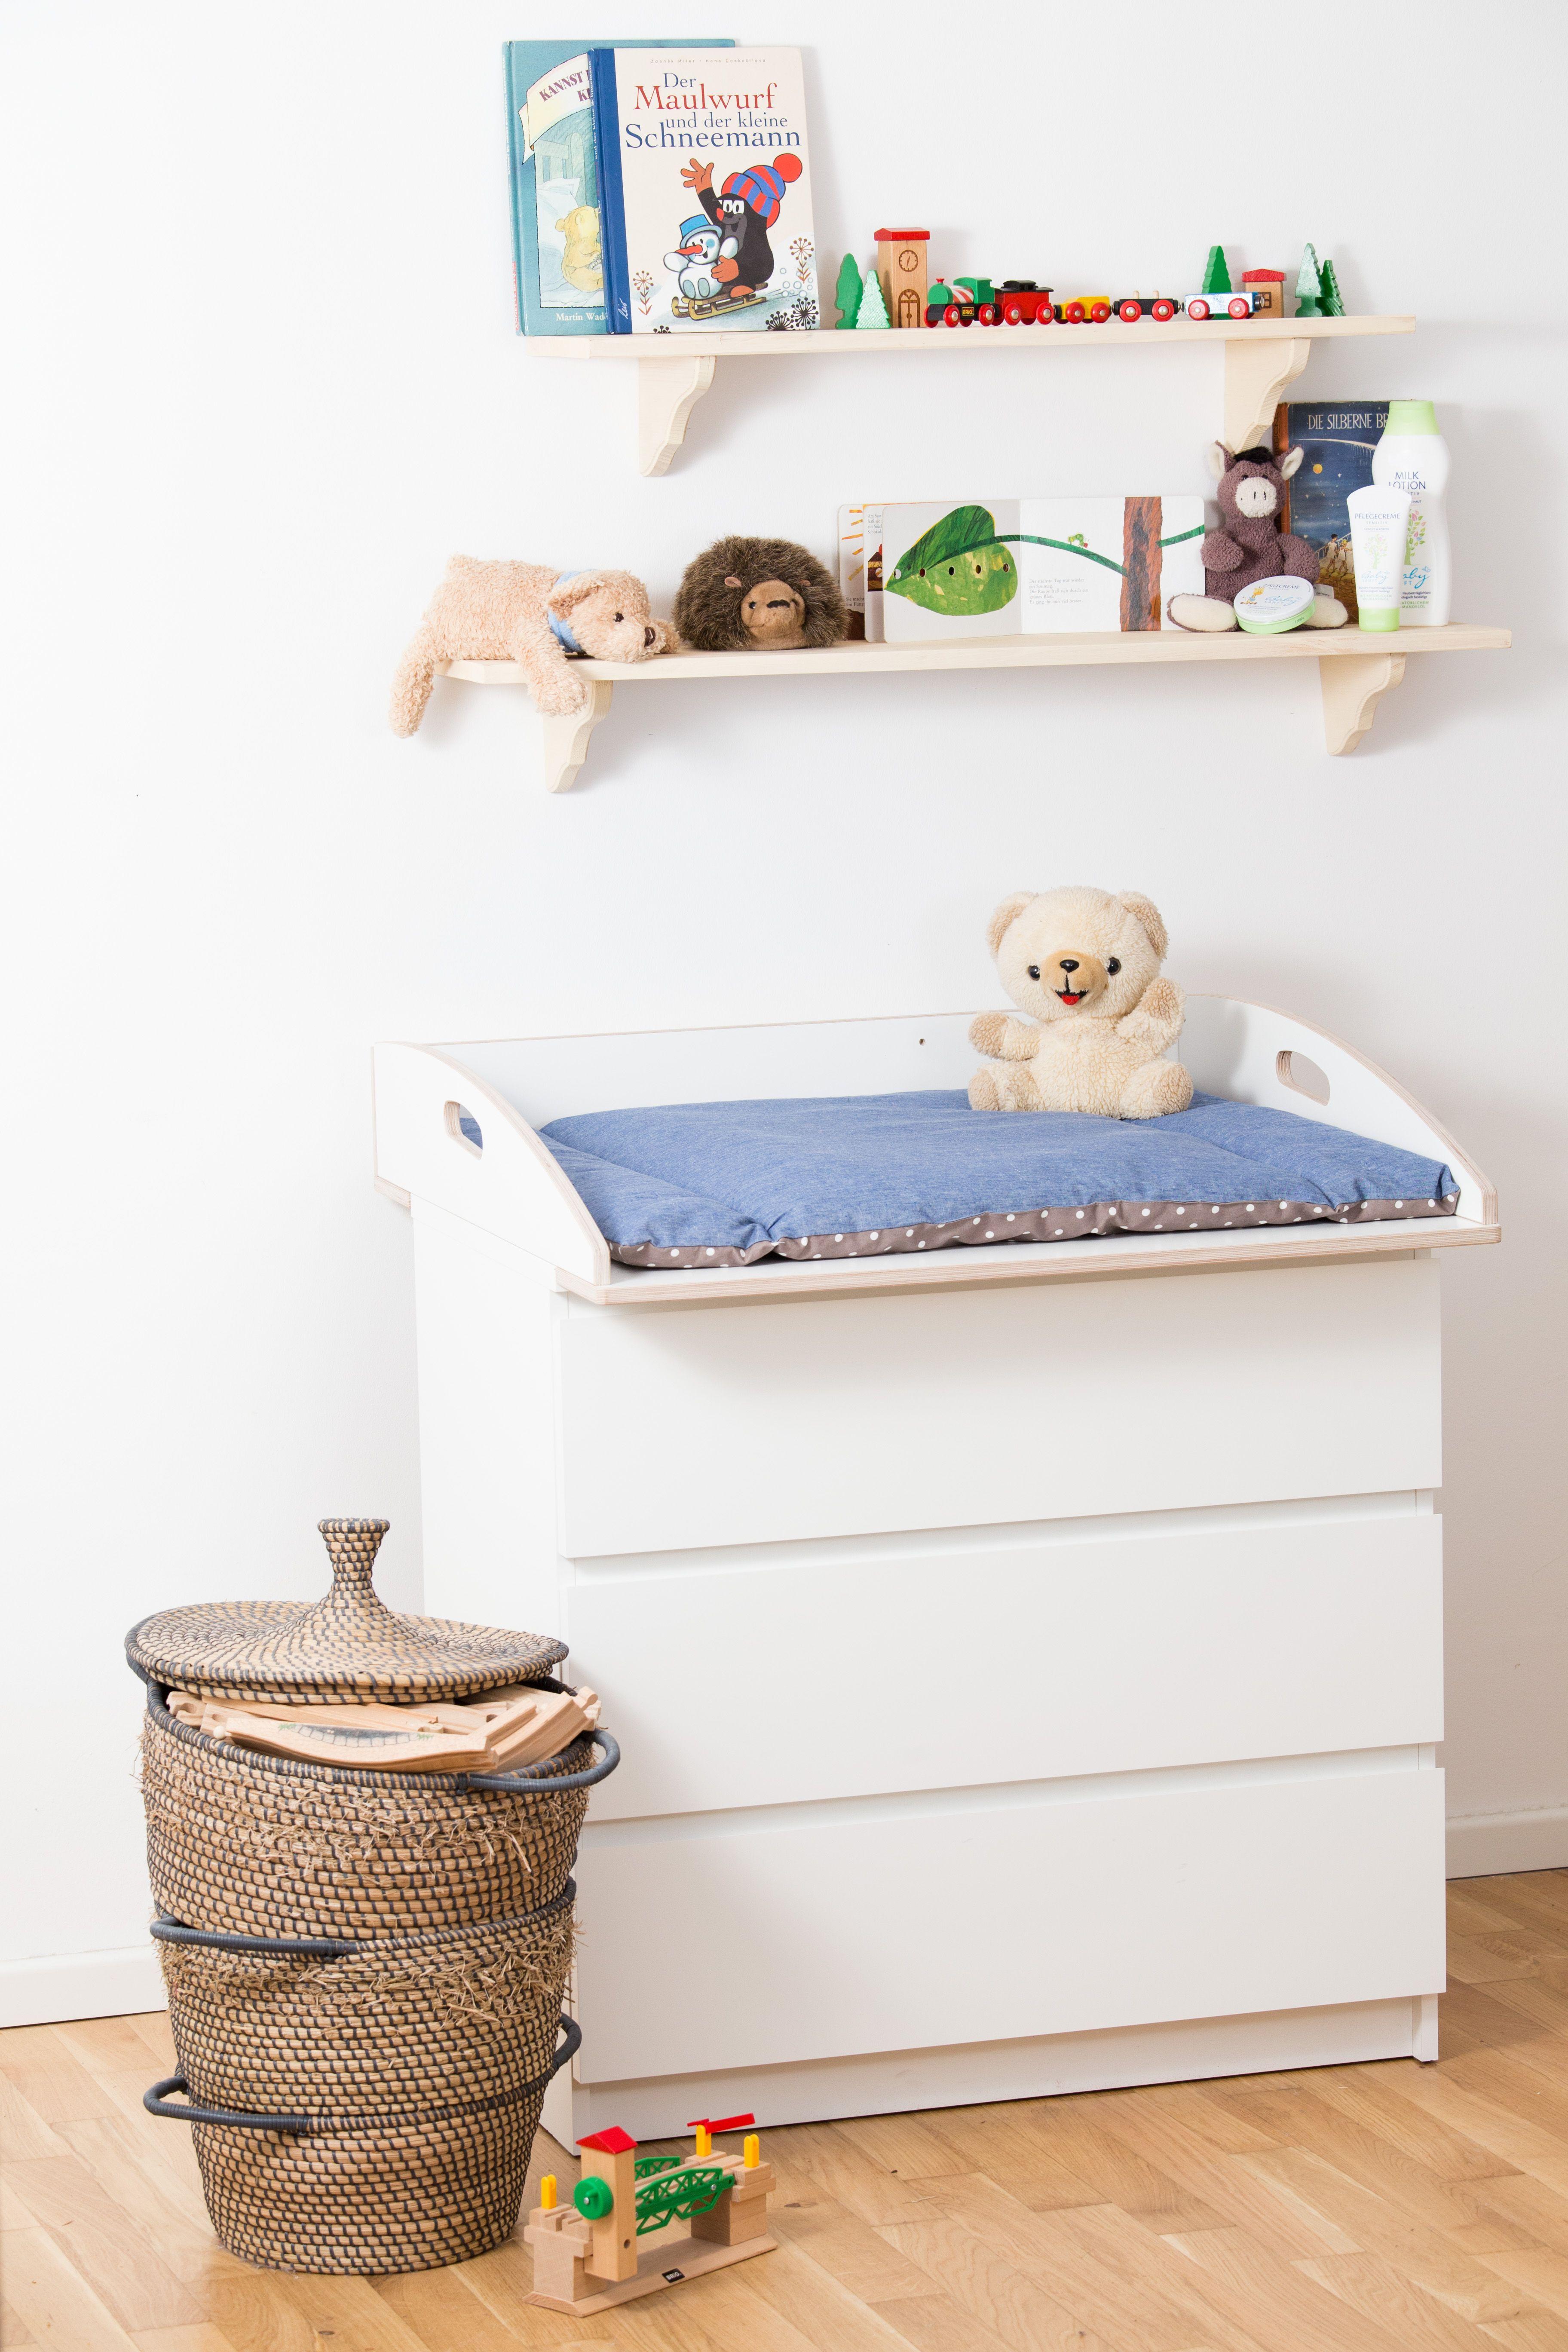 wickelaufsatz f r ikea malm kommode aus beschichteten birkenholz und runden kanten ikea. Black Bedroom Furniture Sets. Home Design Ideas